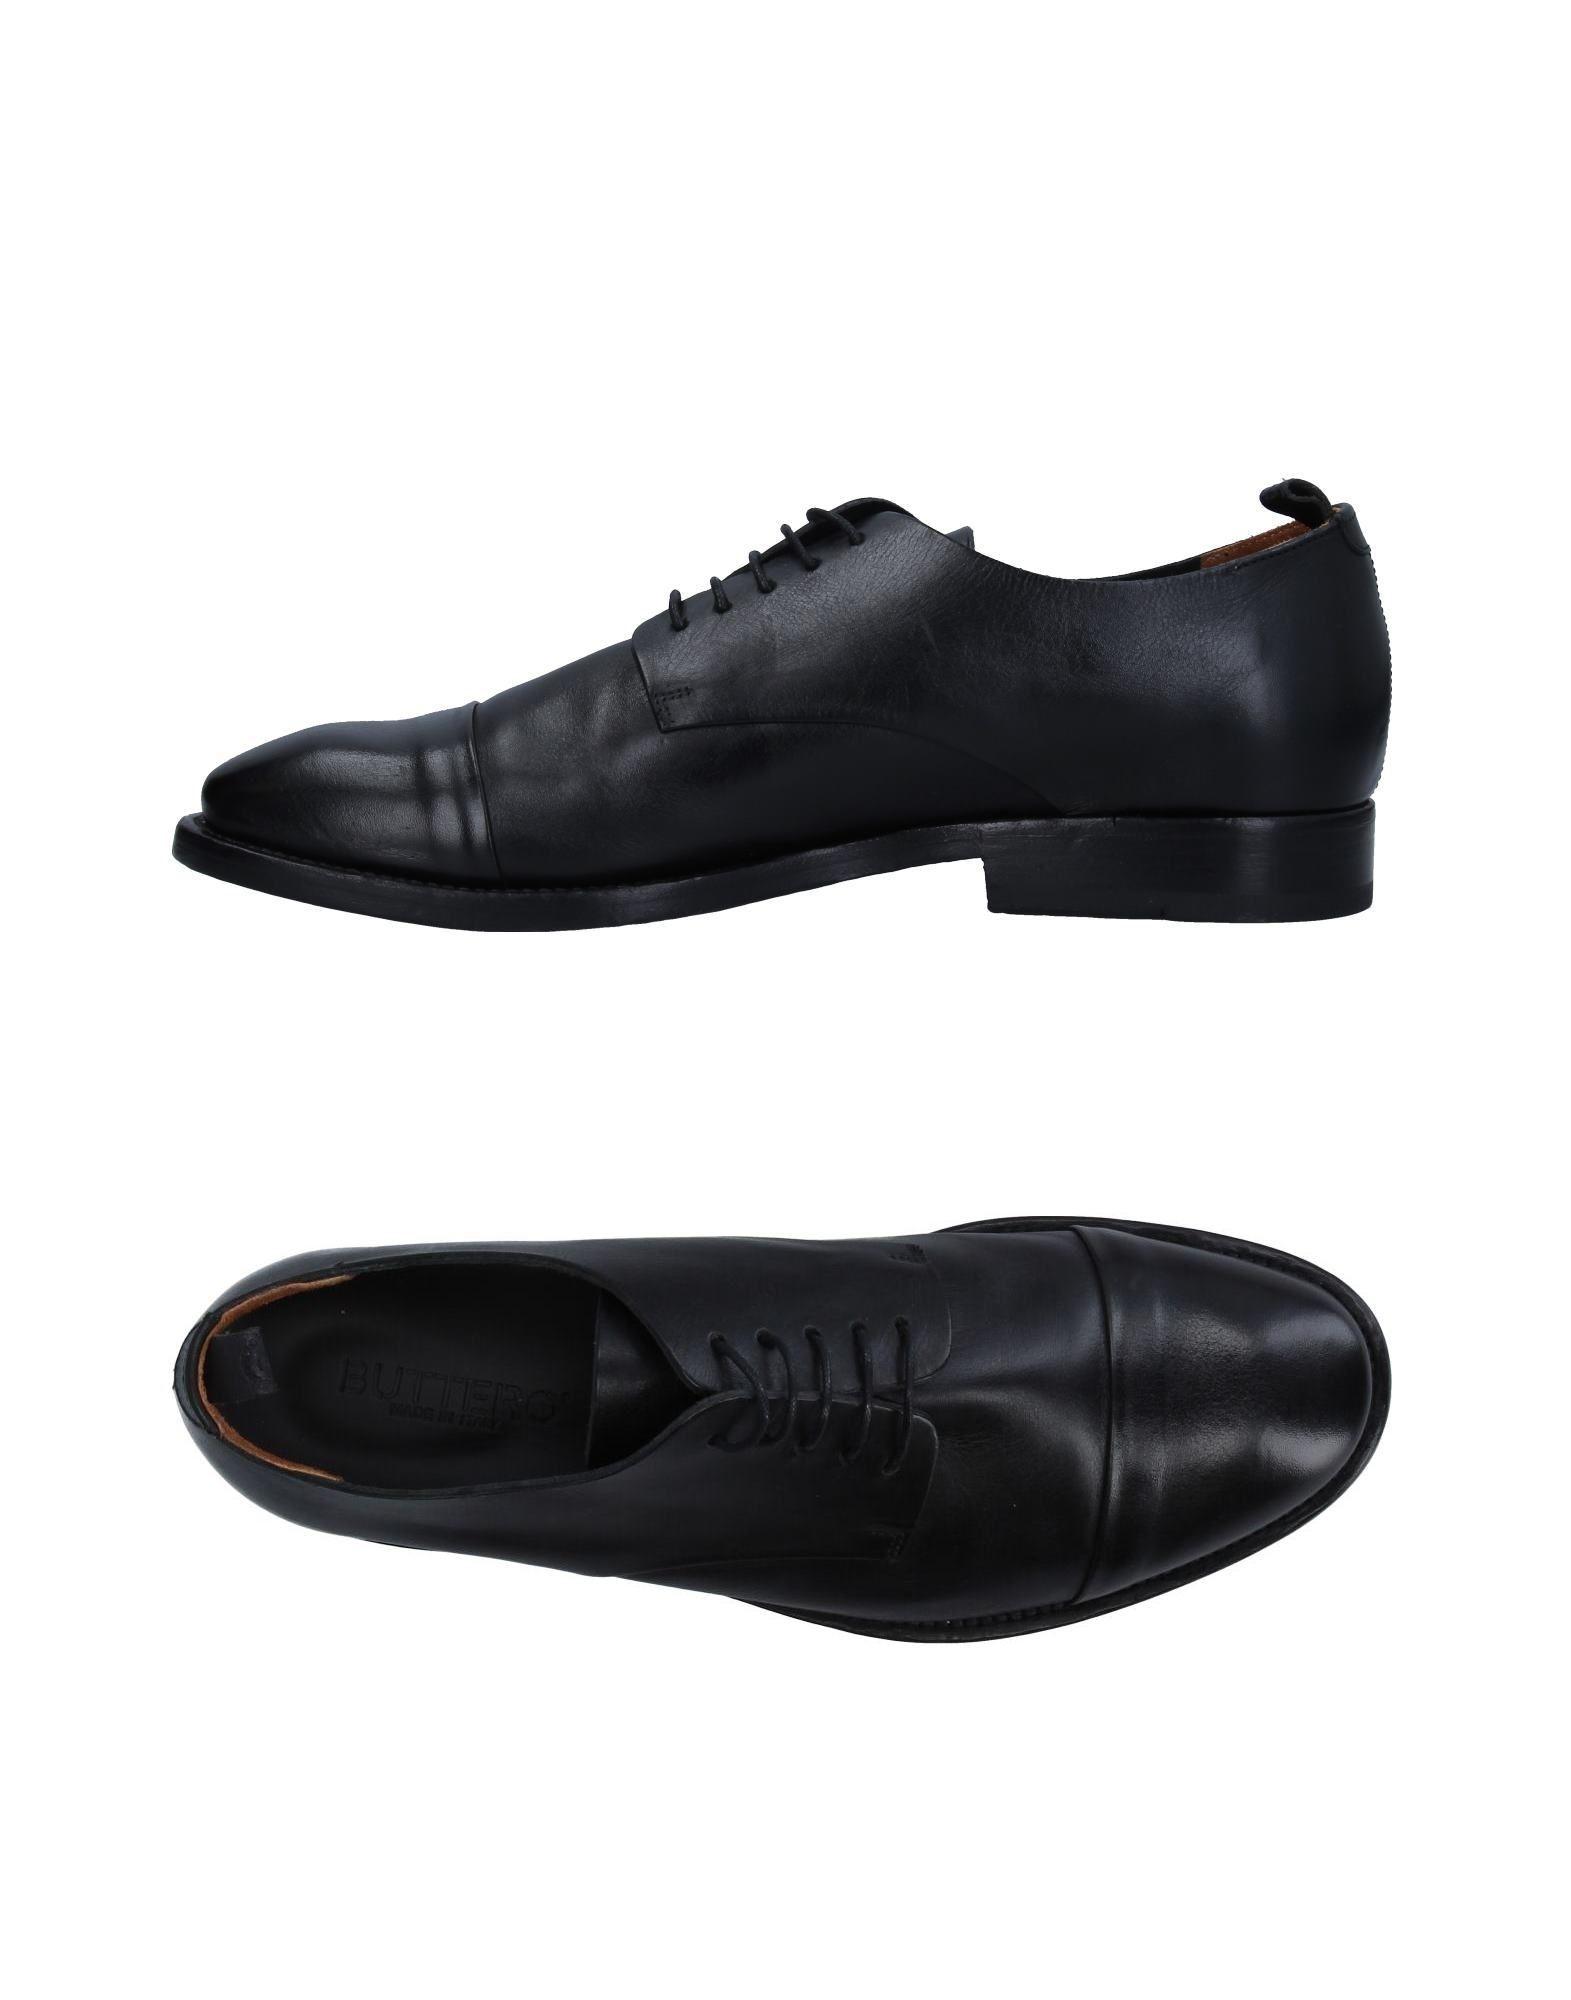 Buttero® Schnürschuhe Herren  11337674IR Gute Qualität beliebte Schuhe